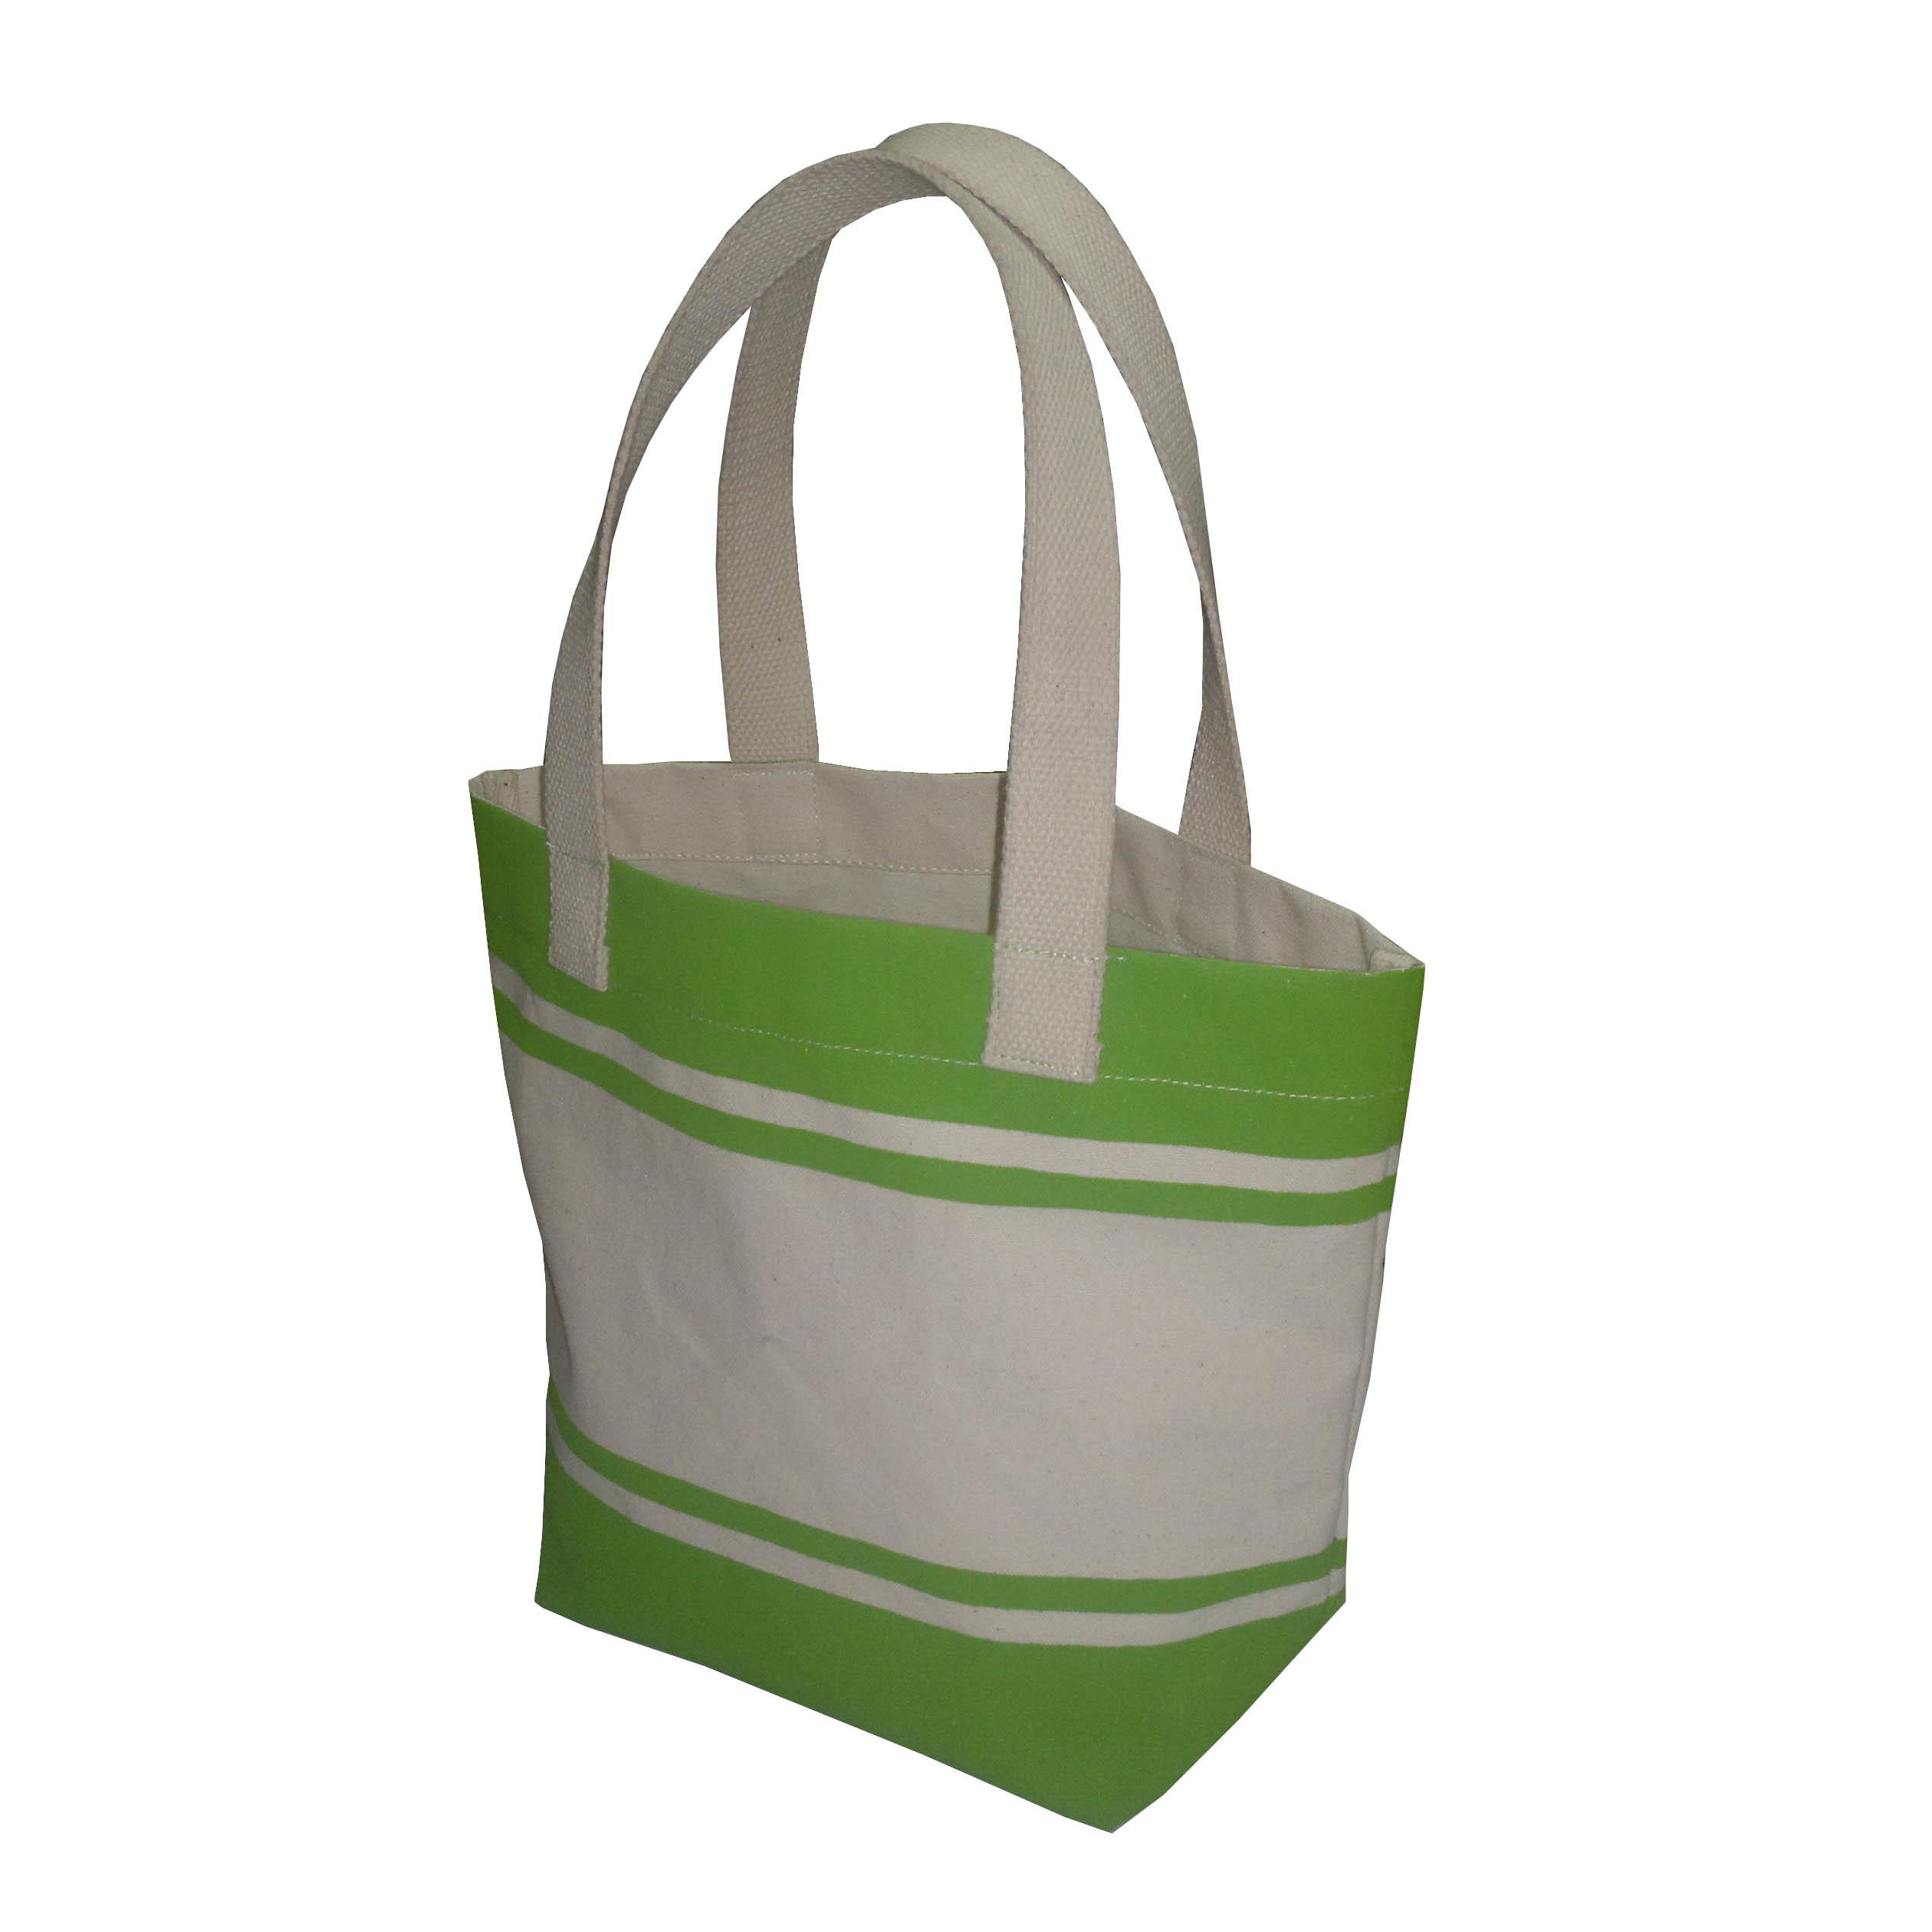 12 Oz Natural Canvas Striped Print Tote Bag